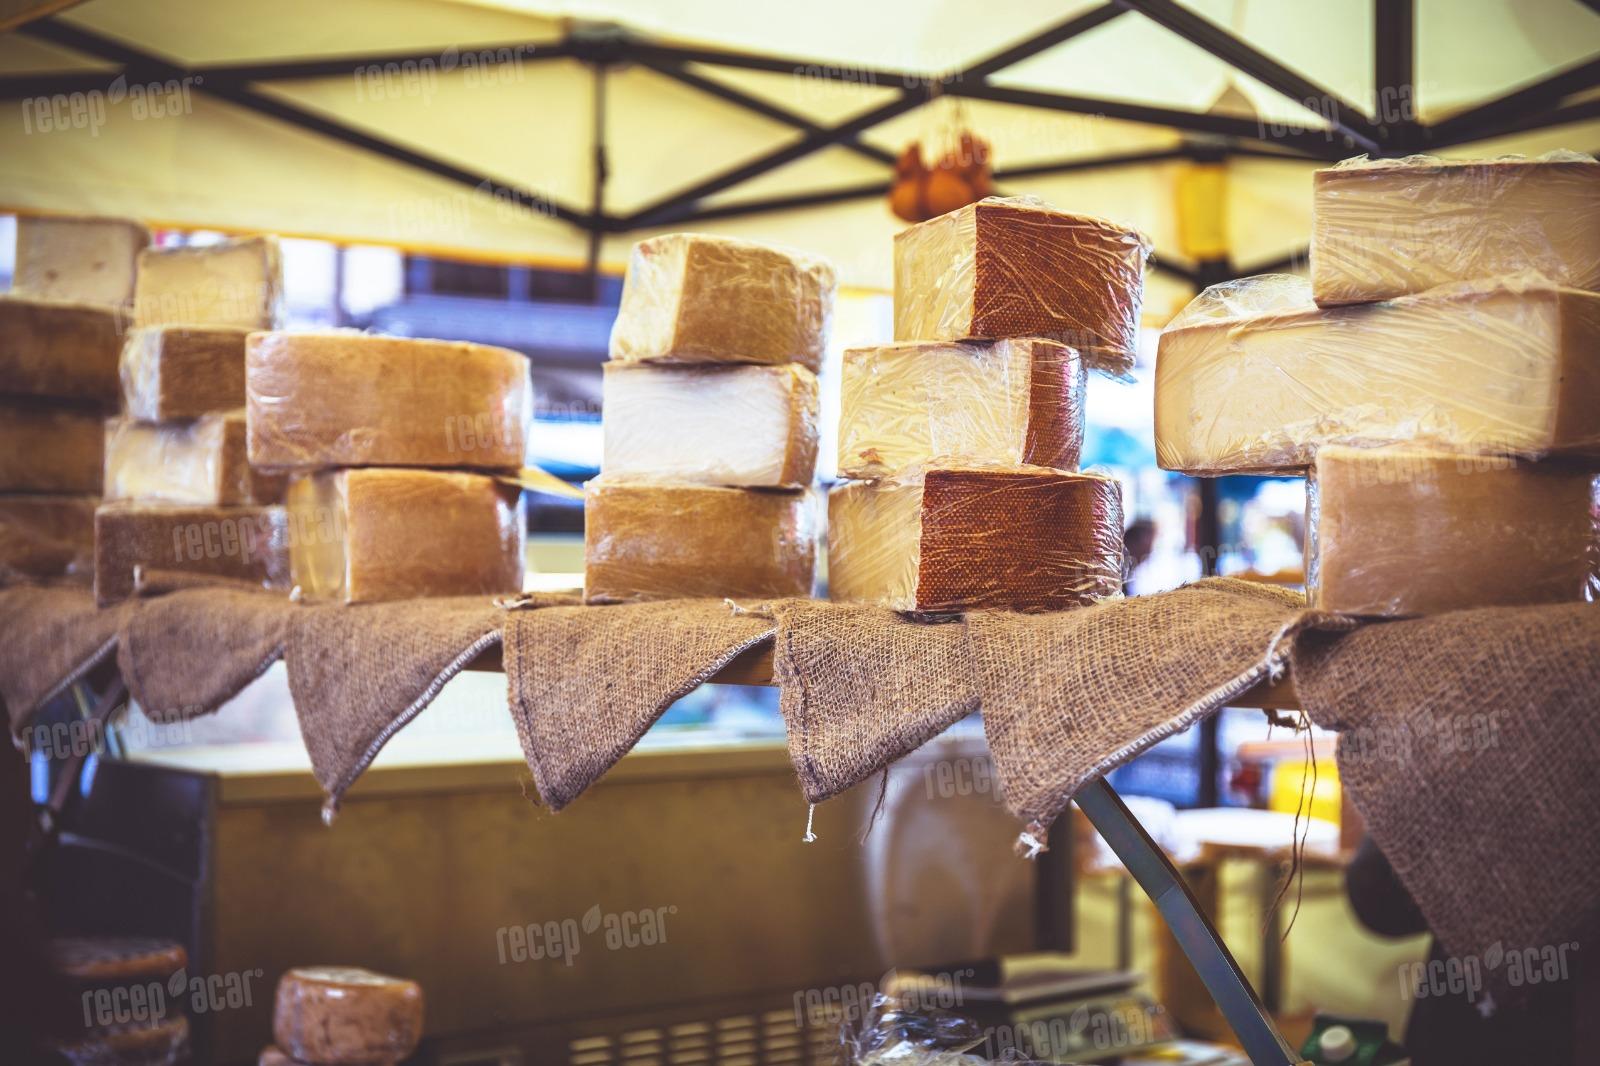 Pazarda satýlan peynirler zararlý mýdýr?